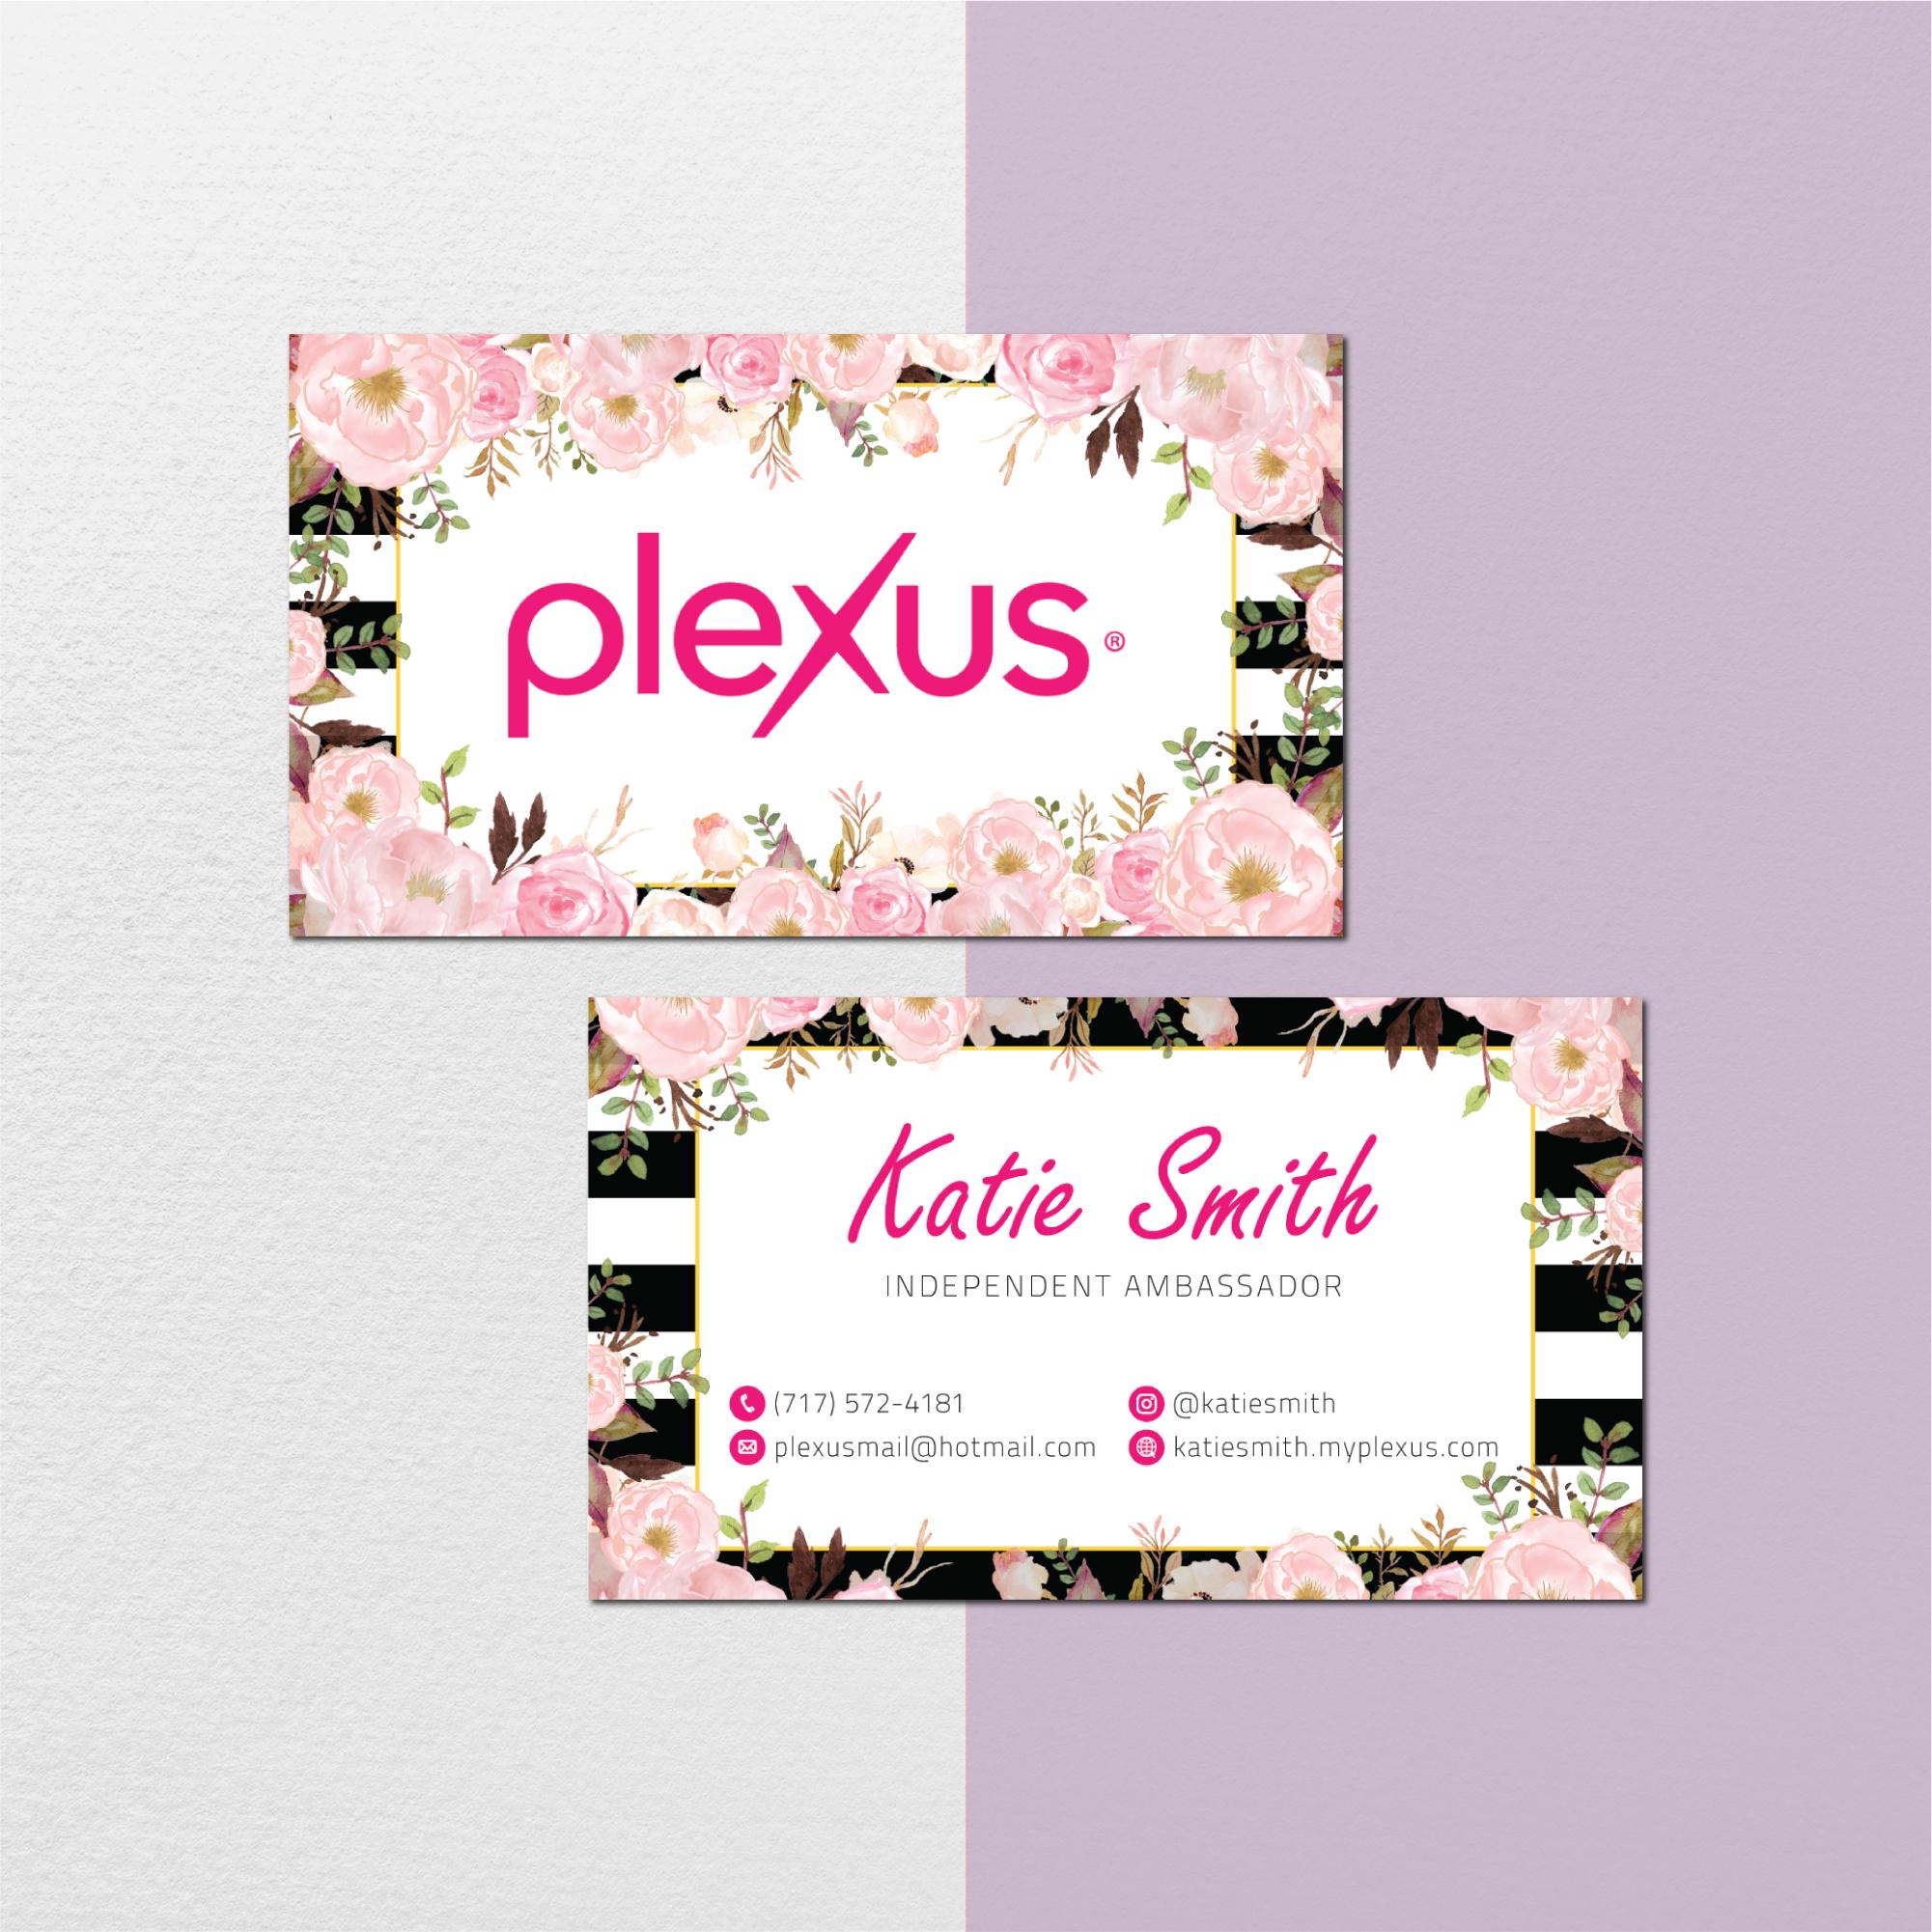 Floral Personalized Plexus Business Cards, Custom Plexus Business Cards, Plexus